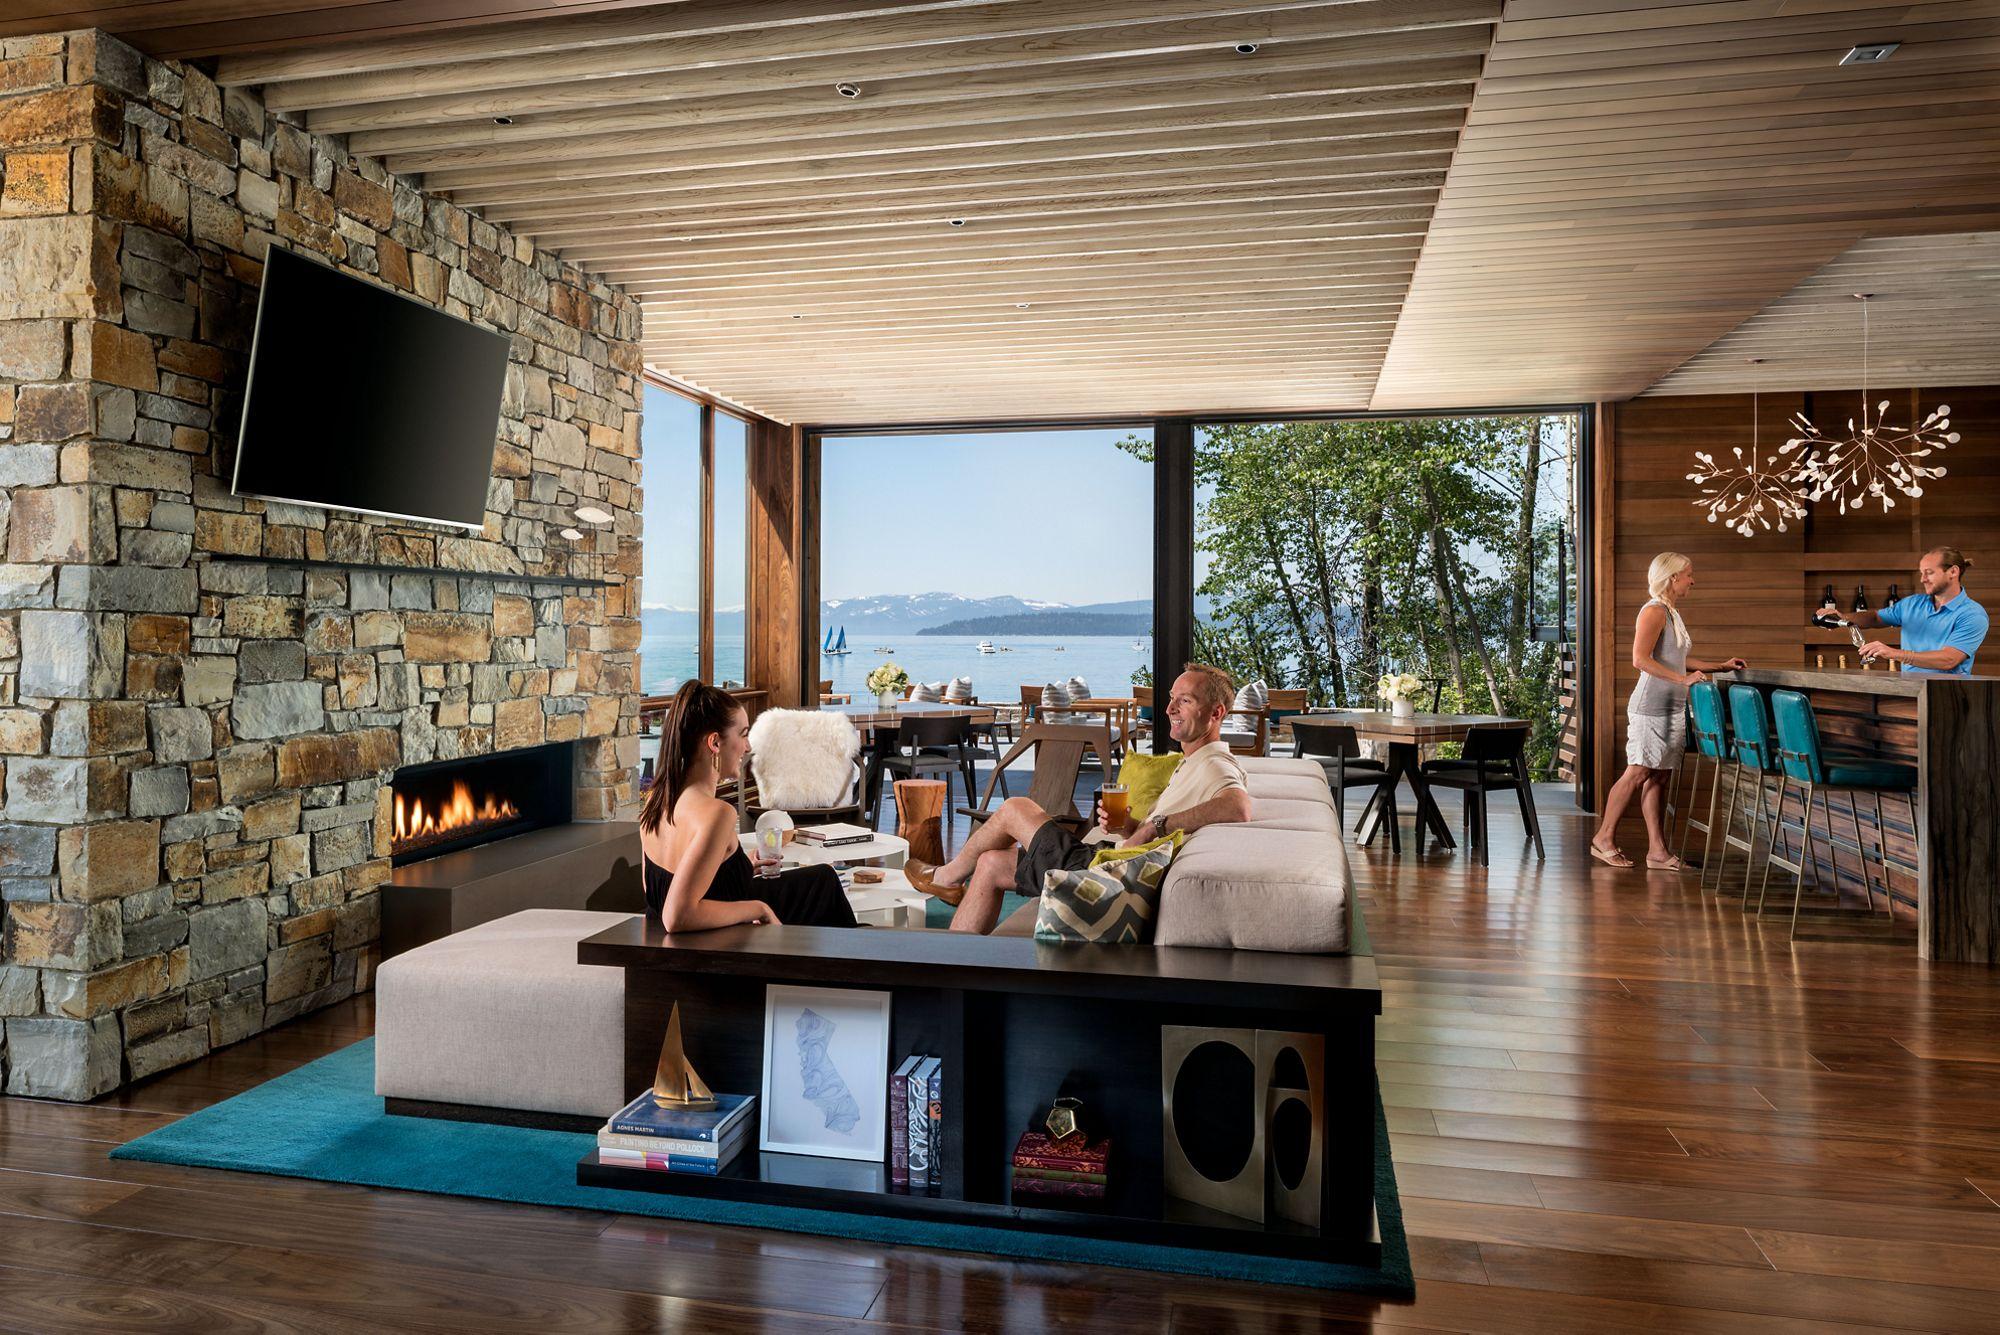 Hotels in North Lake Tahoe - North Lake Tahoe Resorts | The